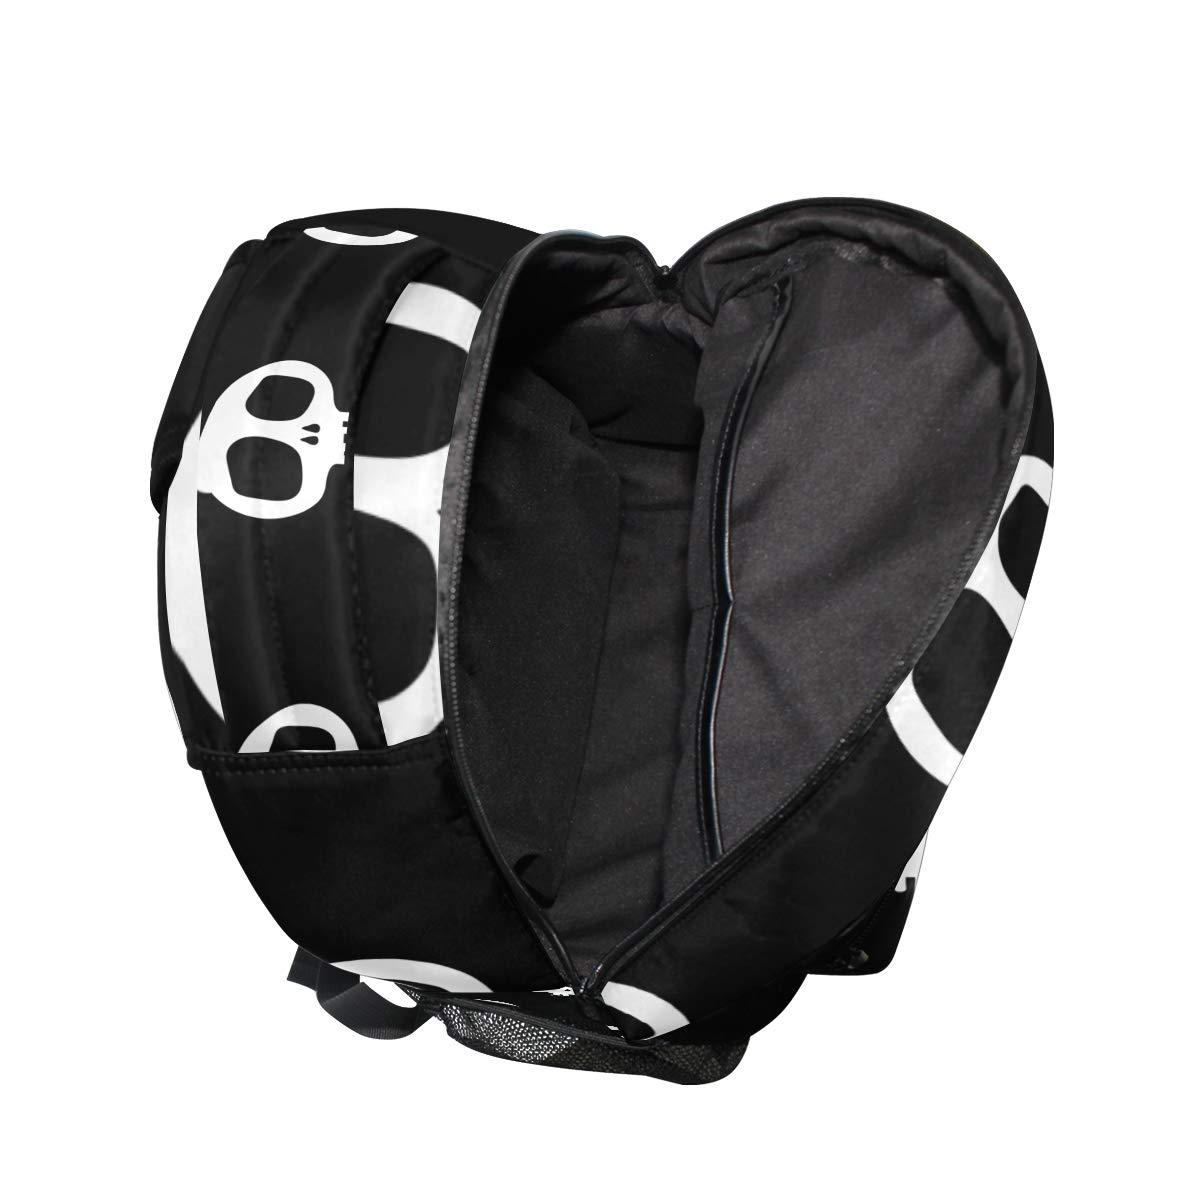 FAJRO- Mochila de Viaje, diseño de Esqueleto, Esqueleto, Esqueleto, Color Blanco y Negro 451e1d